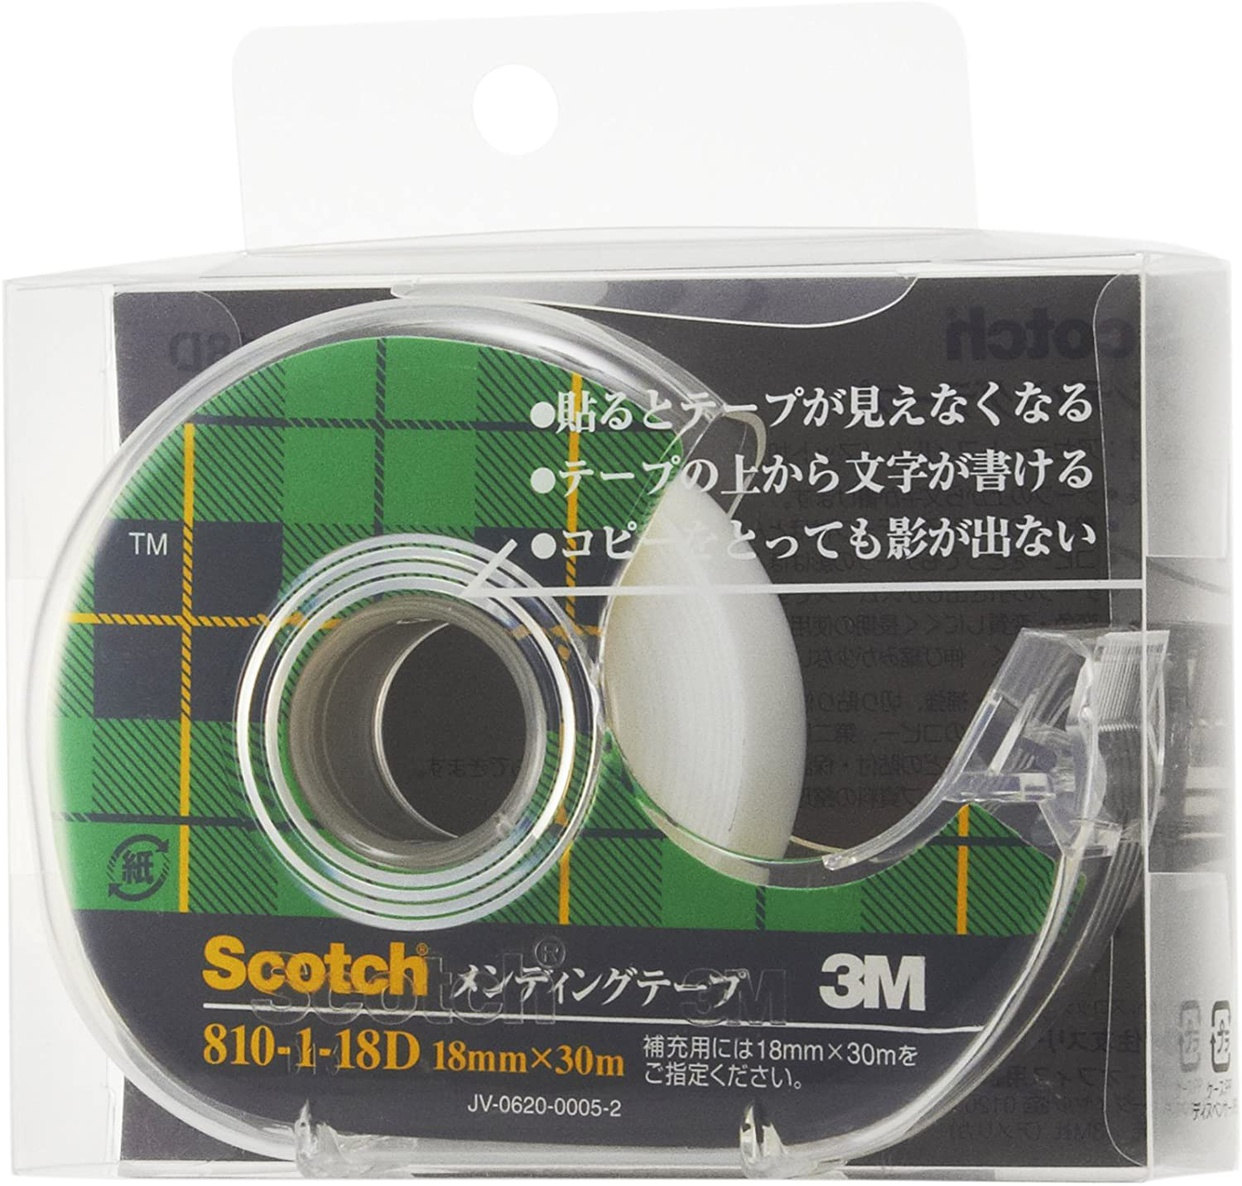 3M(スリーエム) スコッチ メンディングテープ